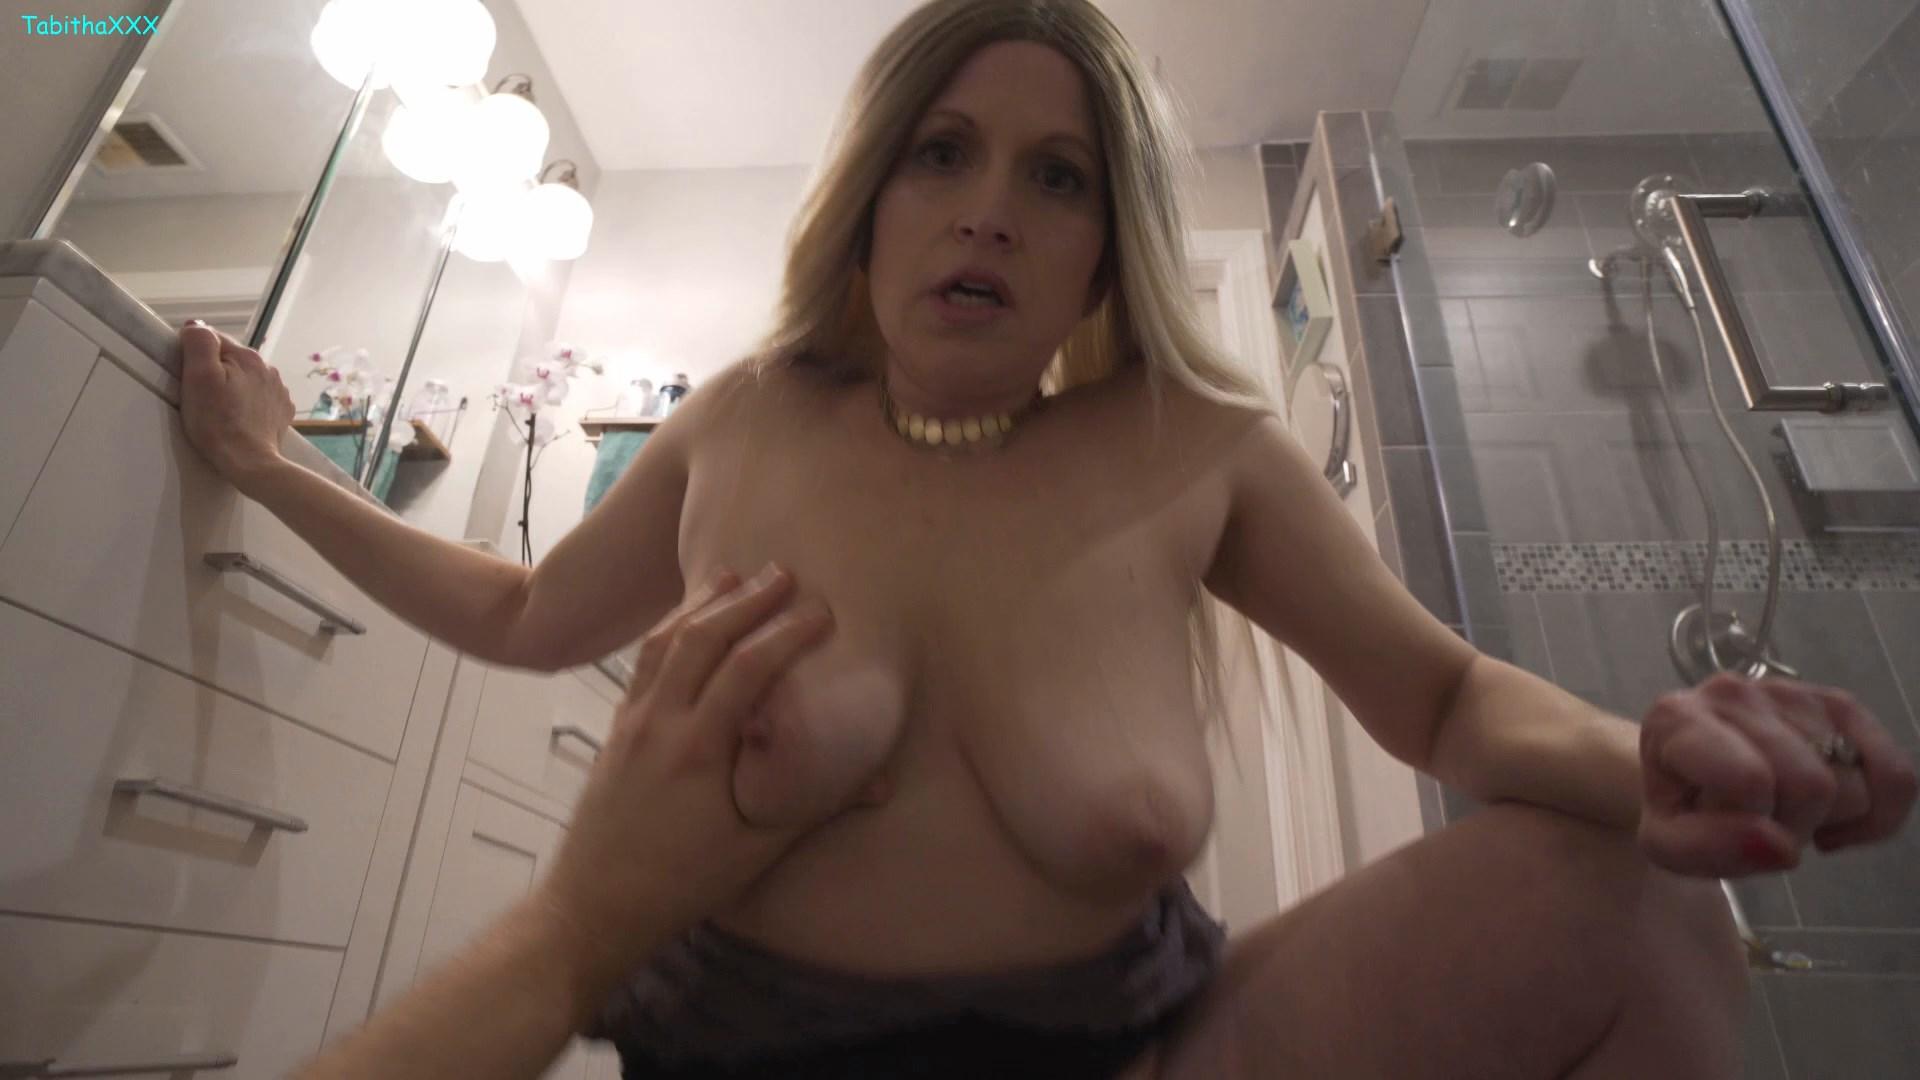 TabithaXXX - Mom/Son Reminisce Pre-Marriage FUCK